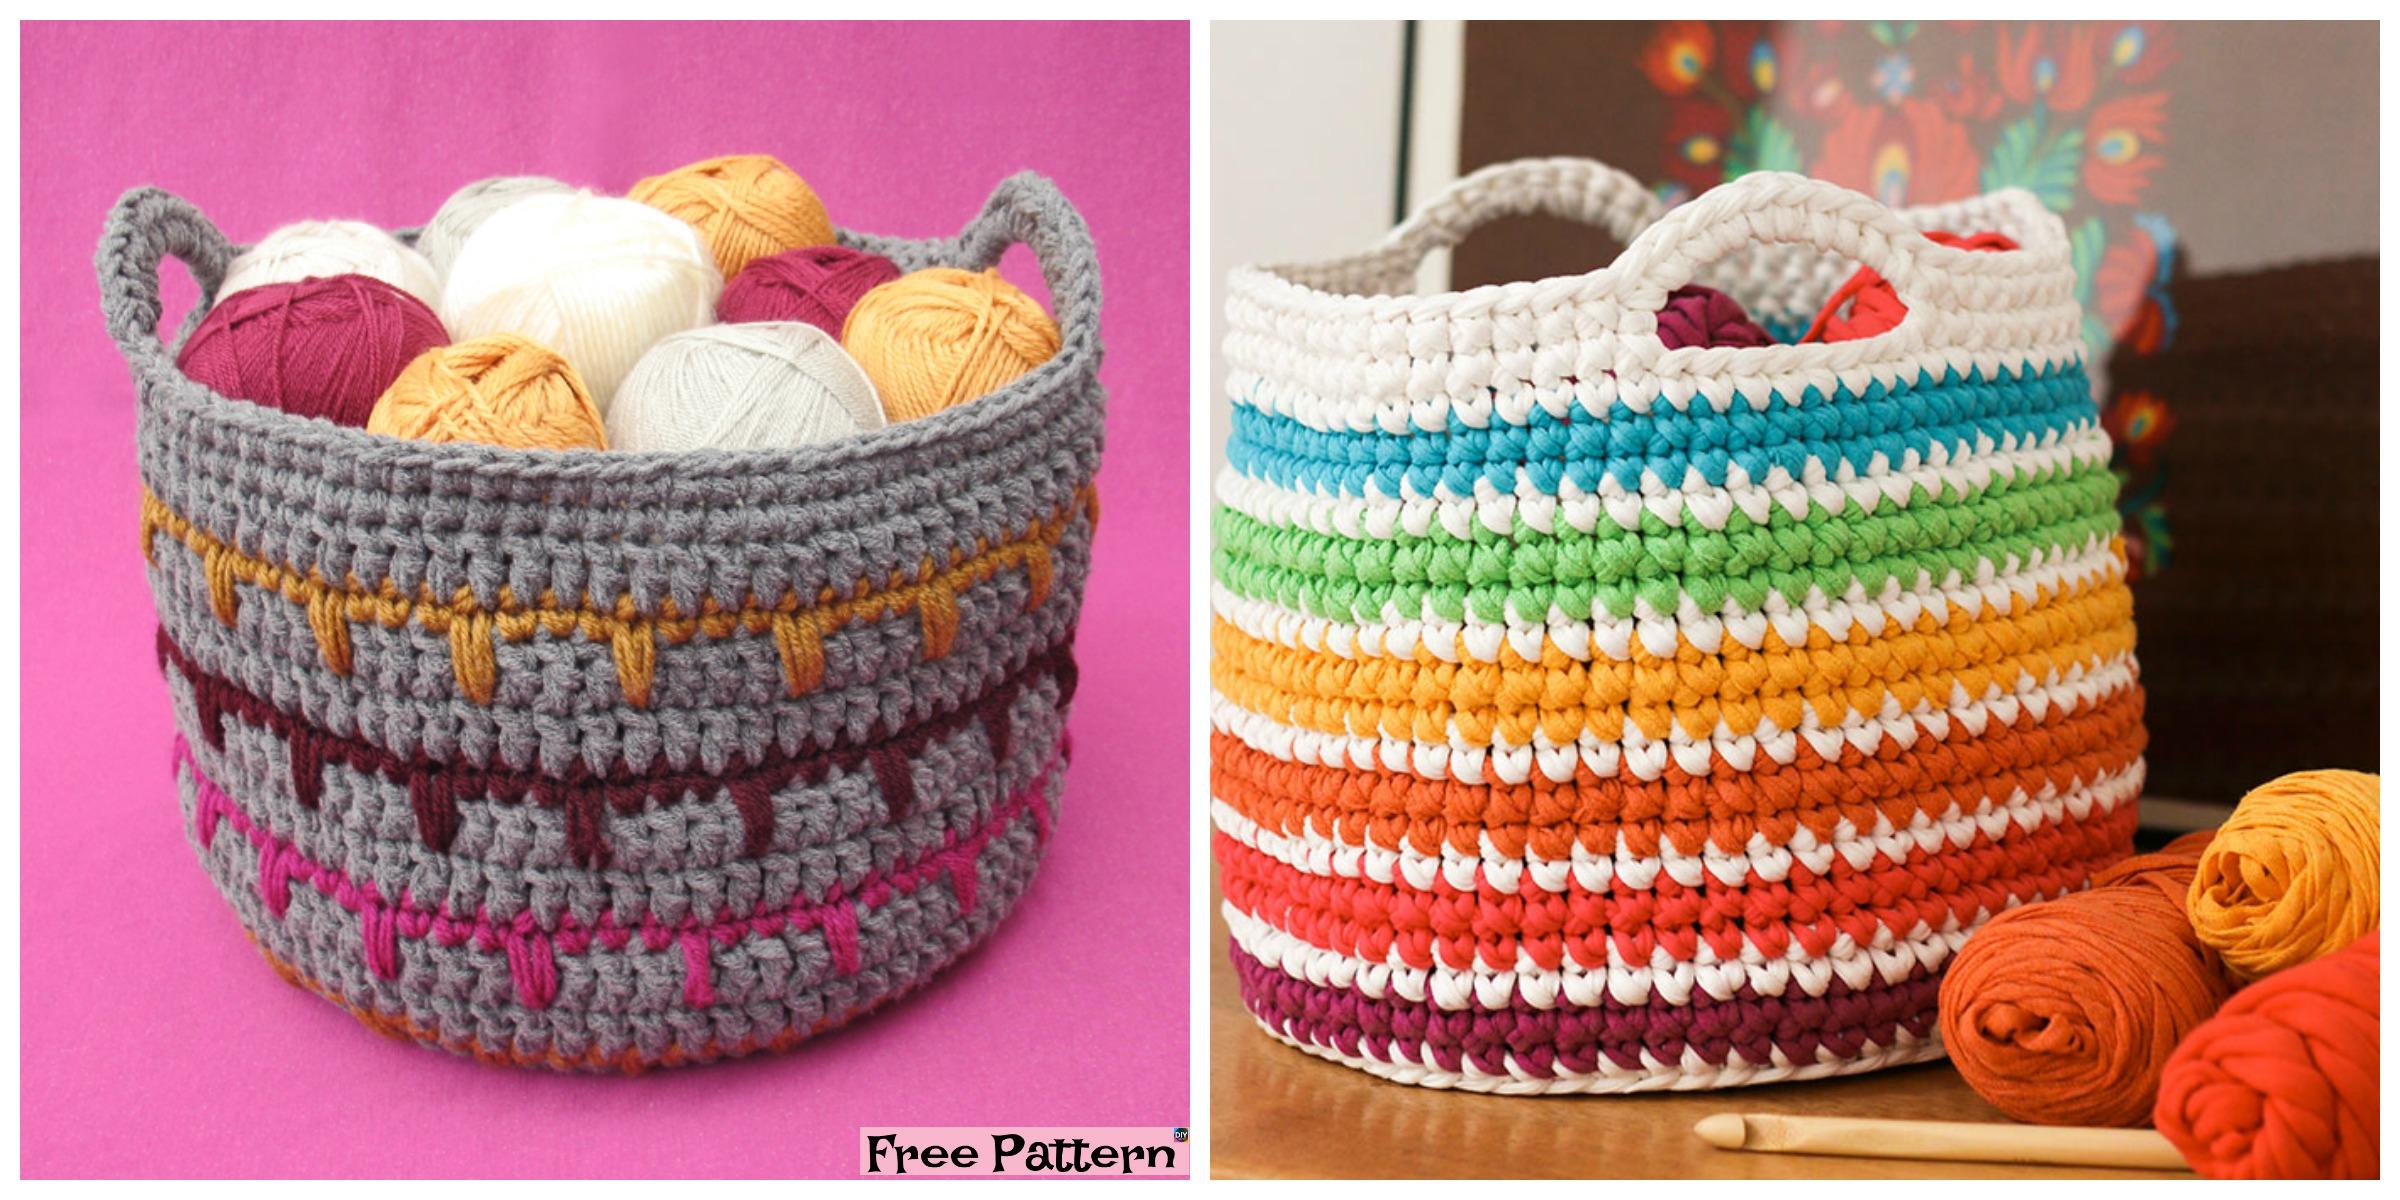 Crochet Spike Stitch Basket – Free Pattern